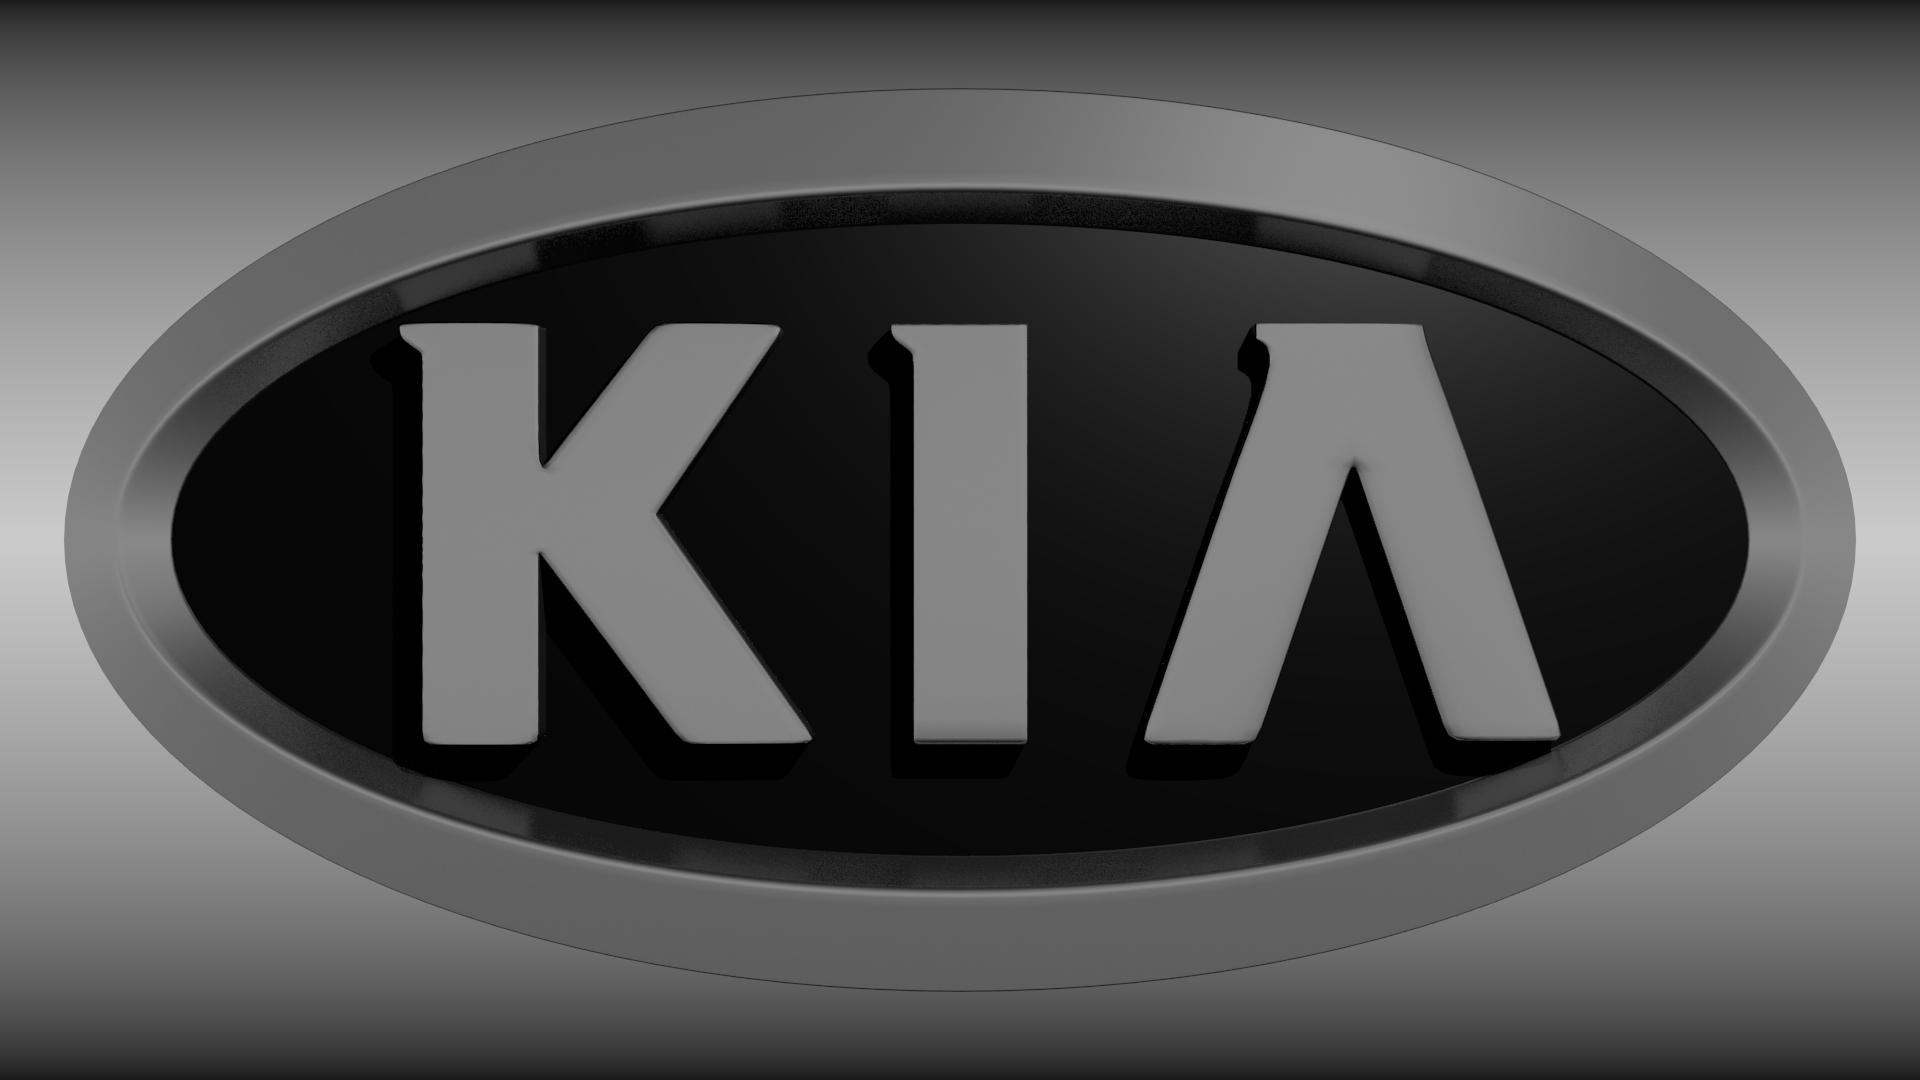 Kia Logo 3d Model Cgtrader